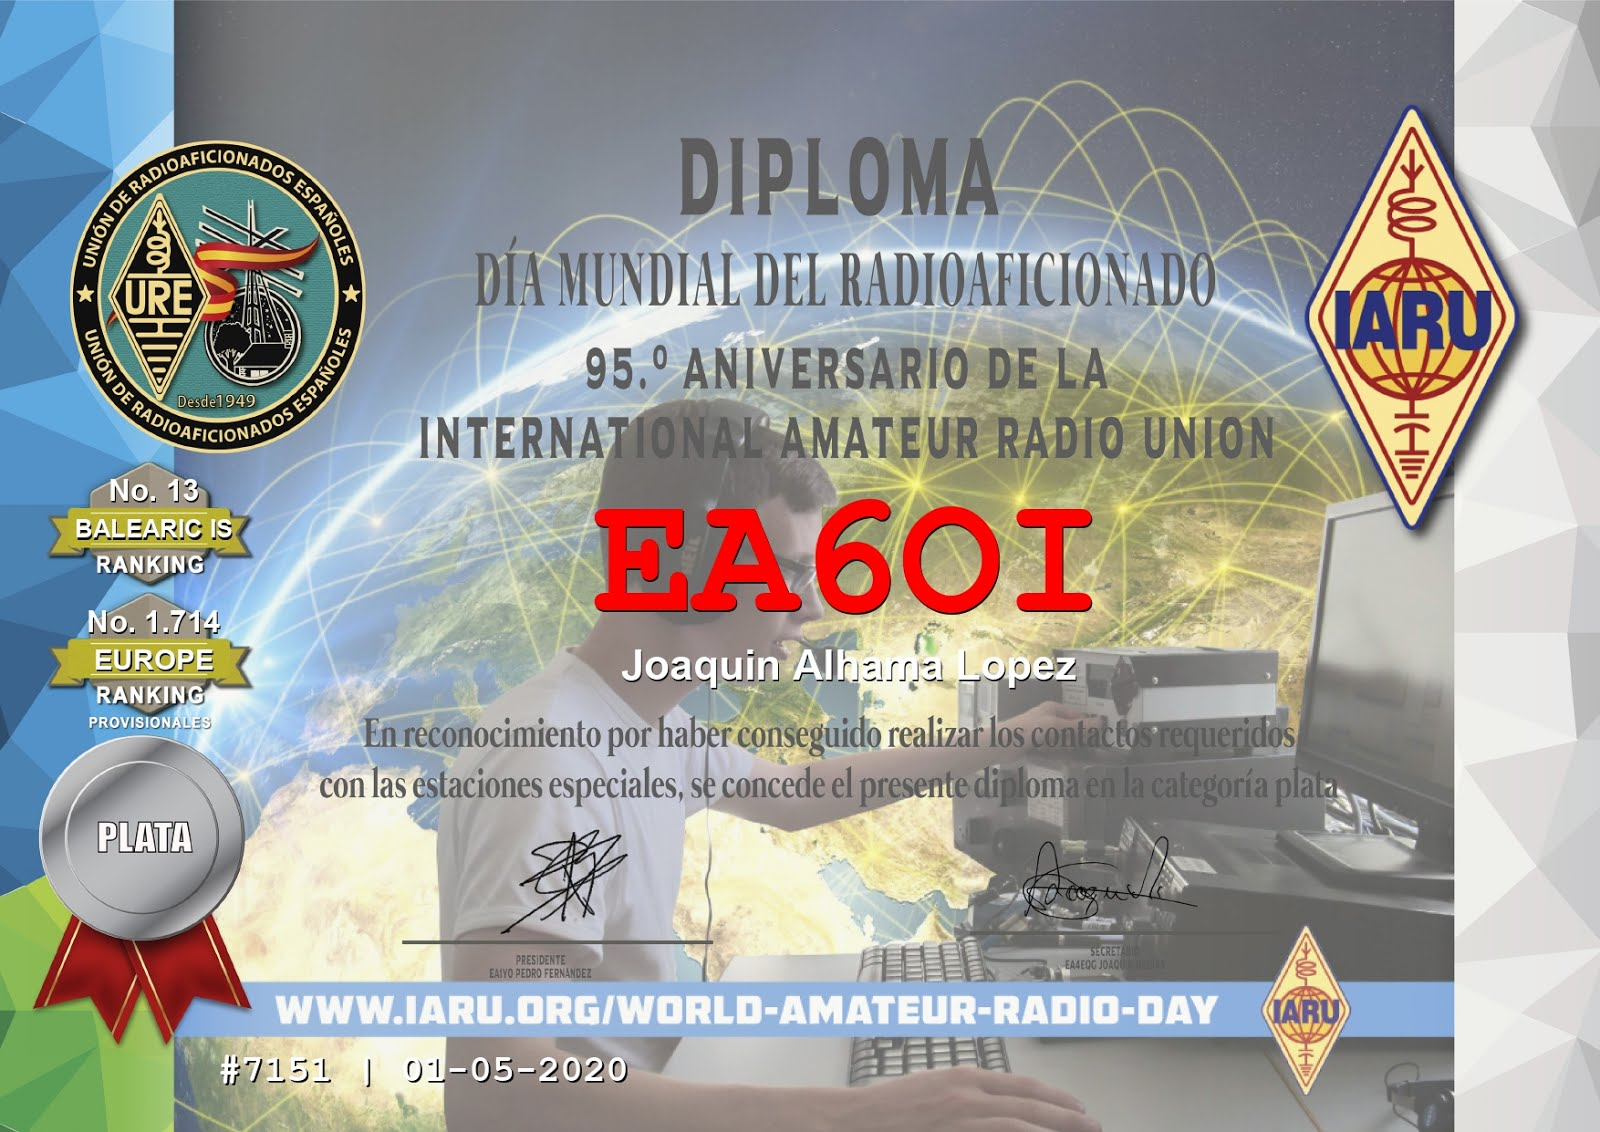 dpl dia mundial del radio aficionado